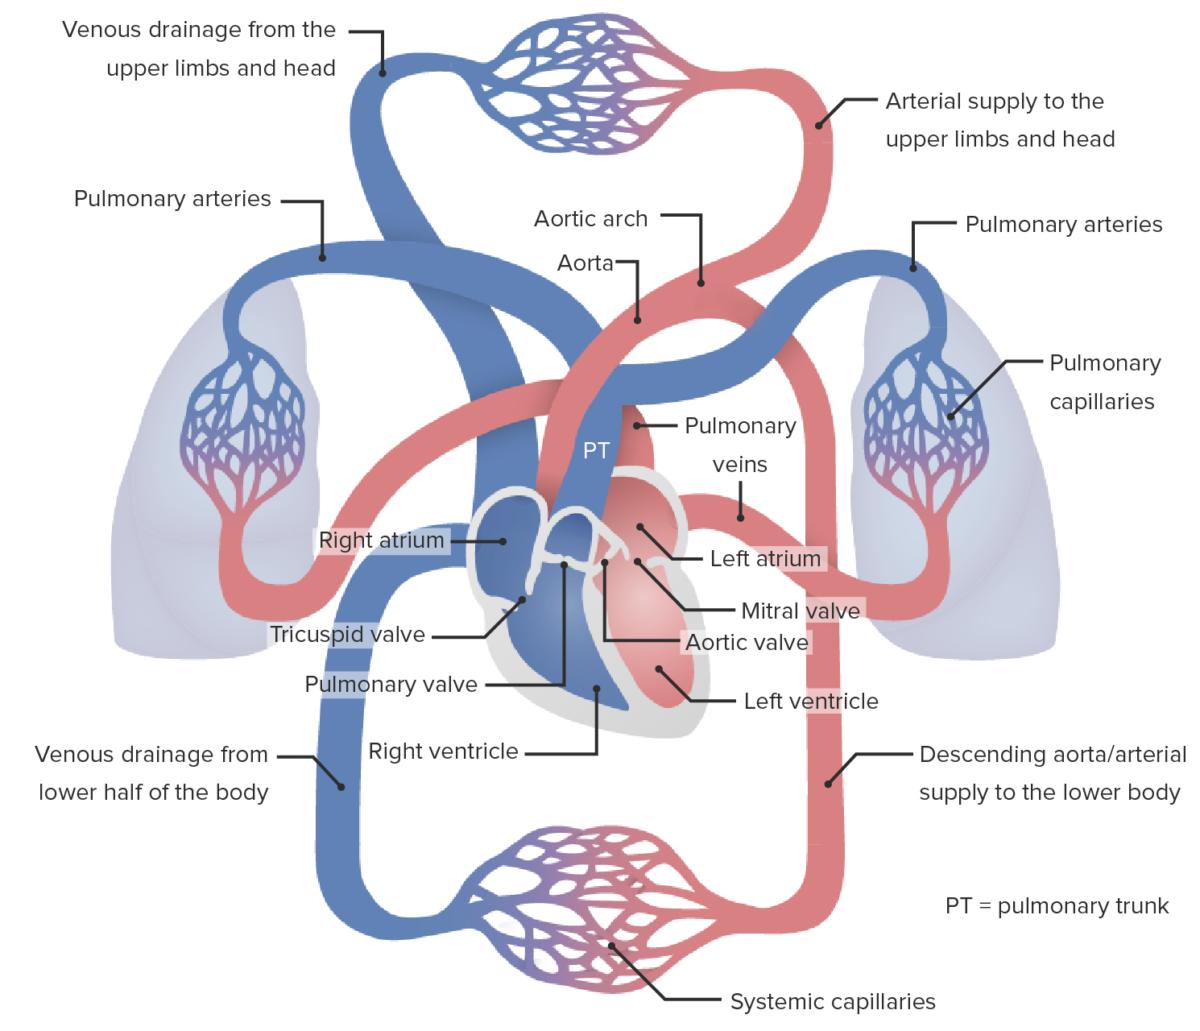 Anatomy review for pulmonary hypertension